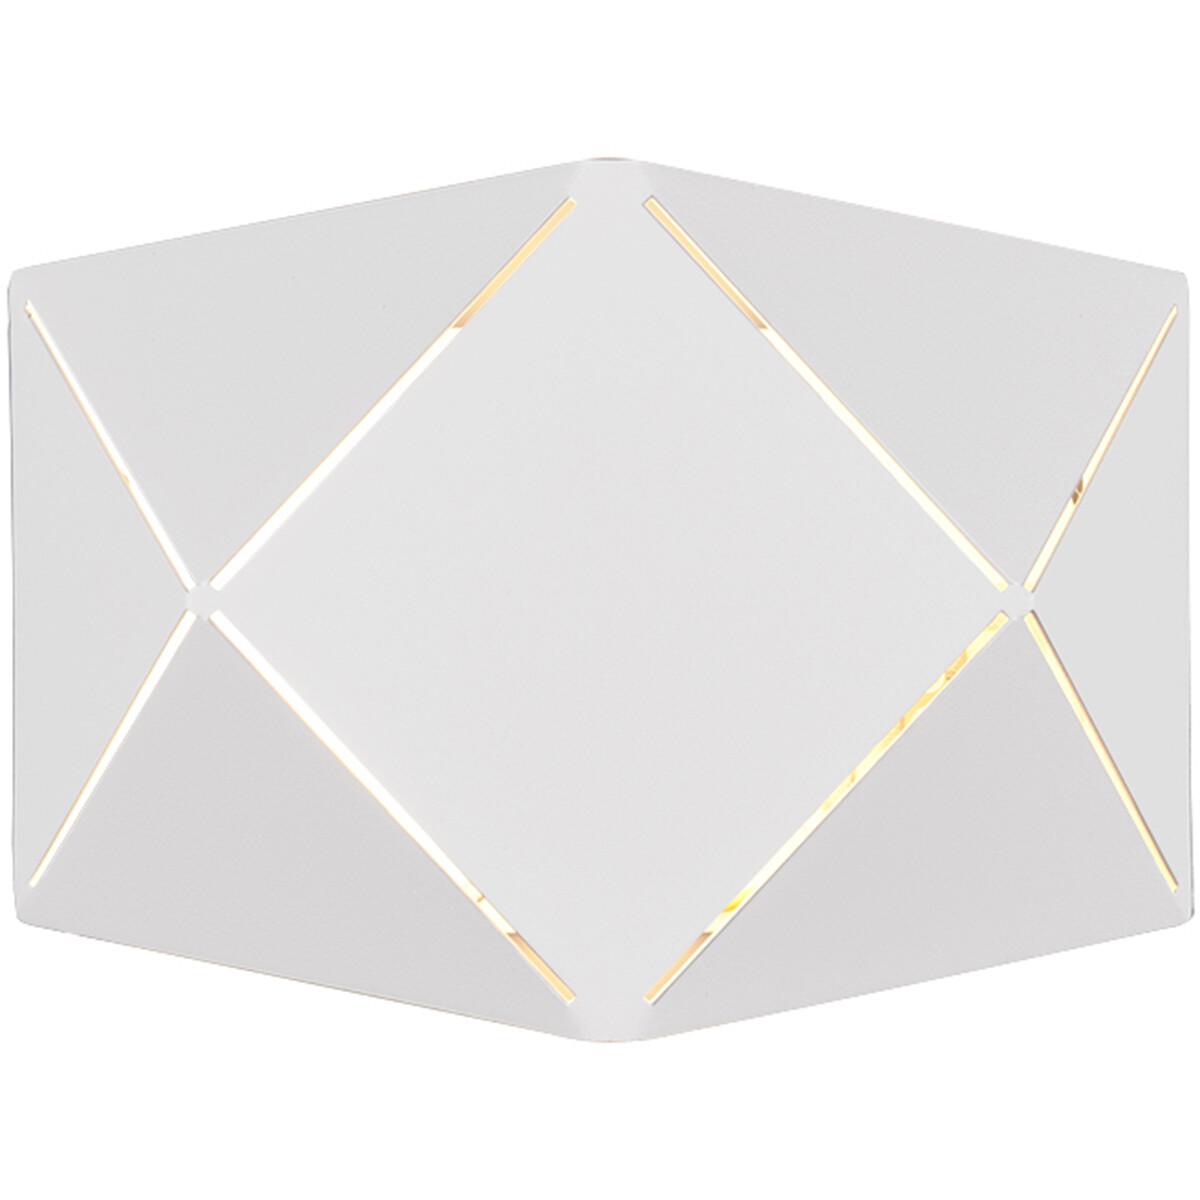 LED Wandlamp - Wandverlichting - Trion Zanda - 6W - Warm Wit 3000K - Rond - Mat Wit - Aluminium